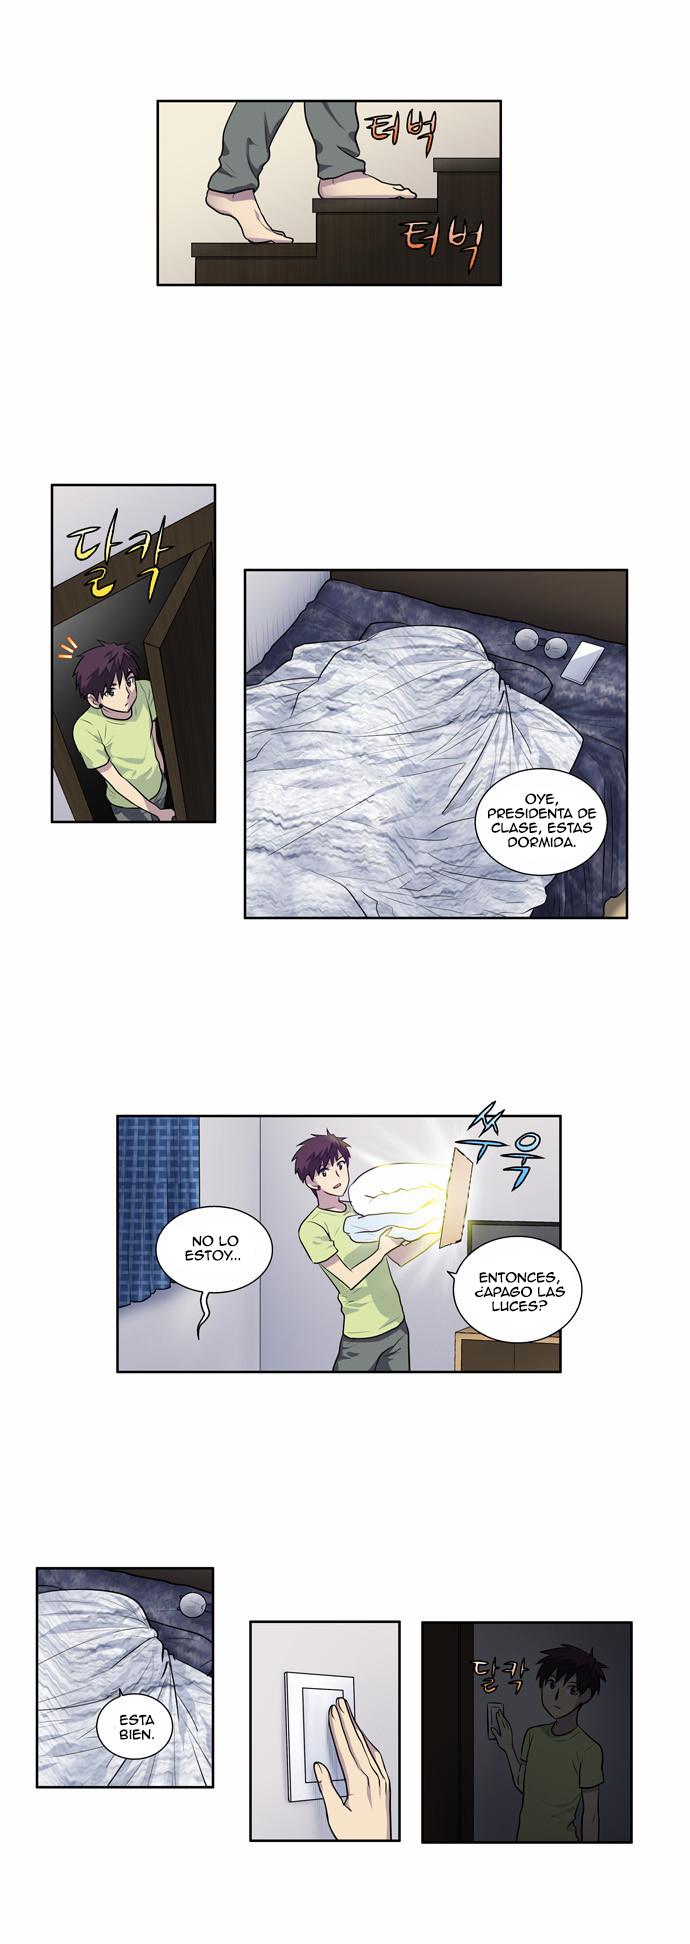 https://c5.ninemanga.com/es_manga/61/1725/453062/526487152092c16aa3e9bcf8d650a92f.jpg Page 4